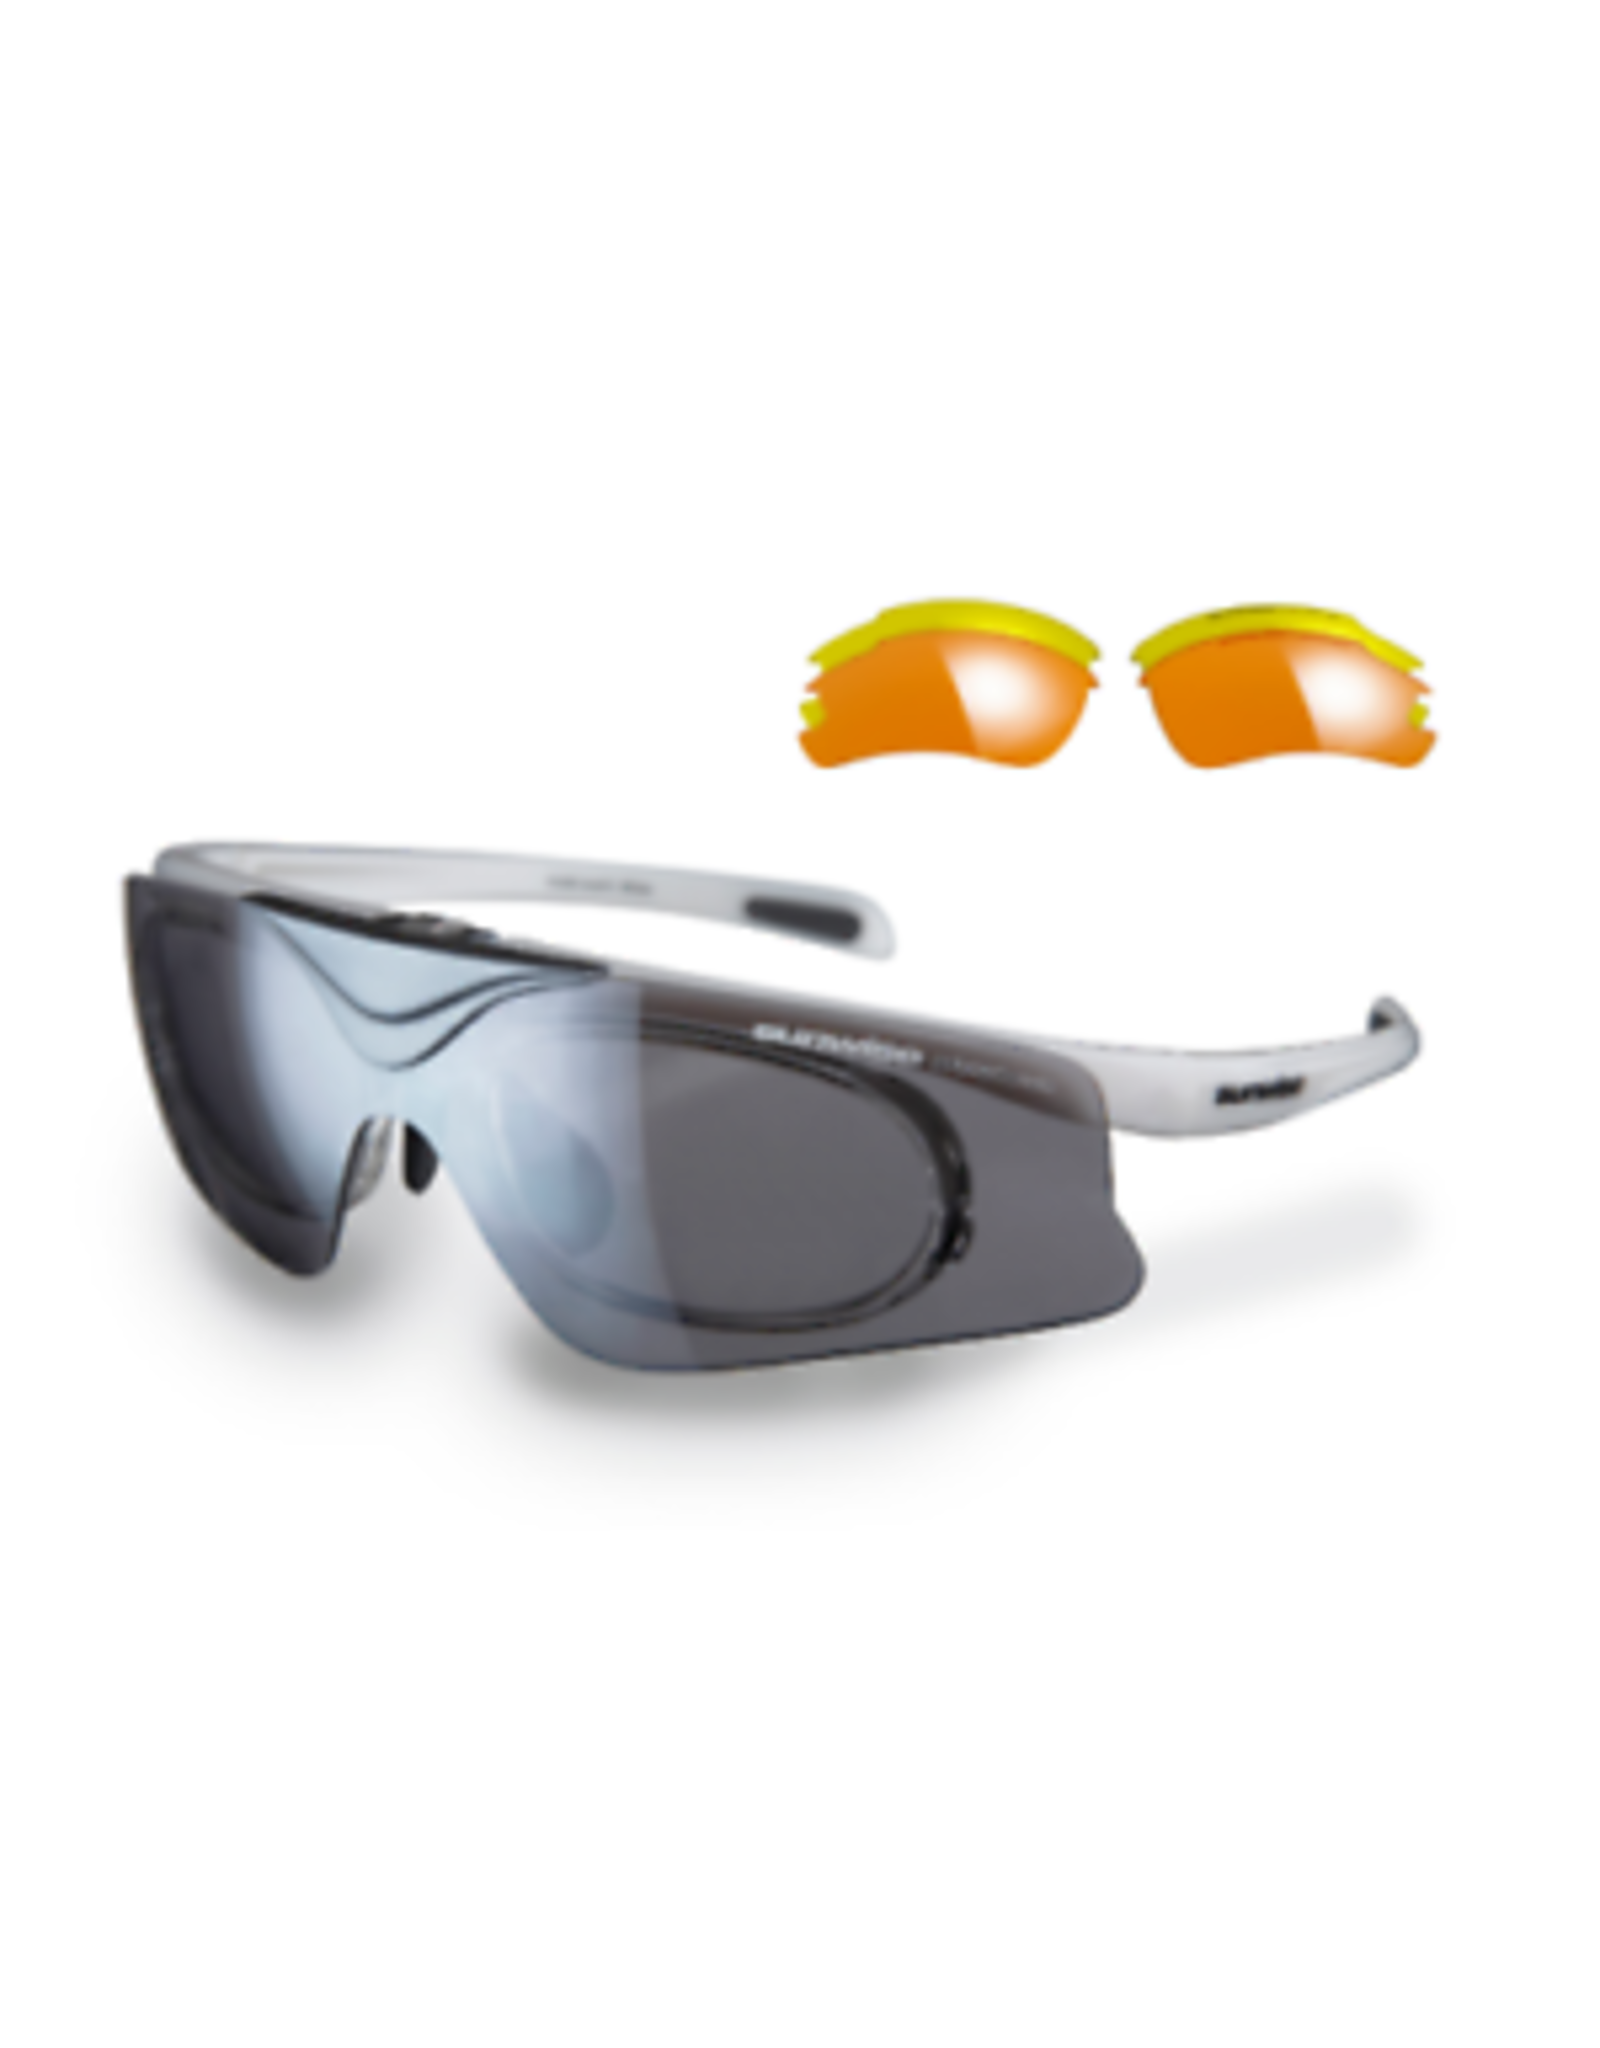 Sunwise Austin Prescription Ready Cycling Sunglasses